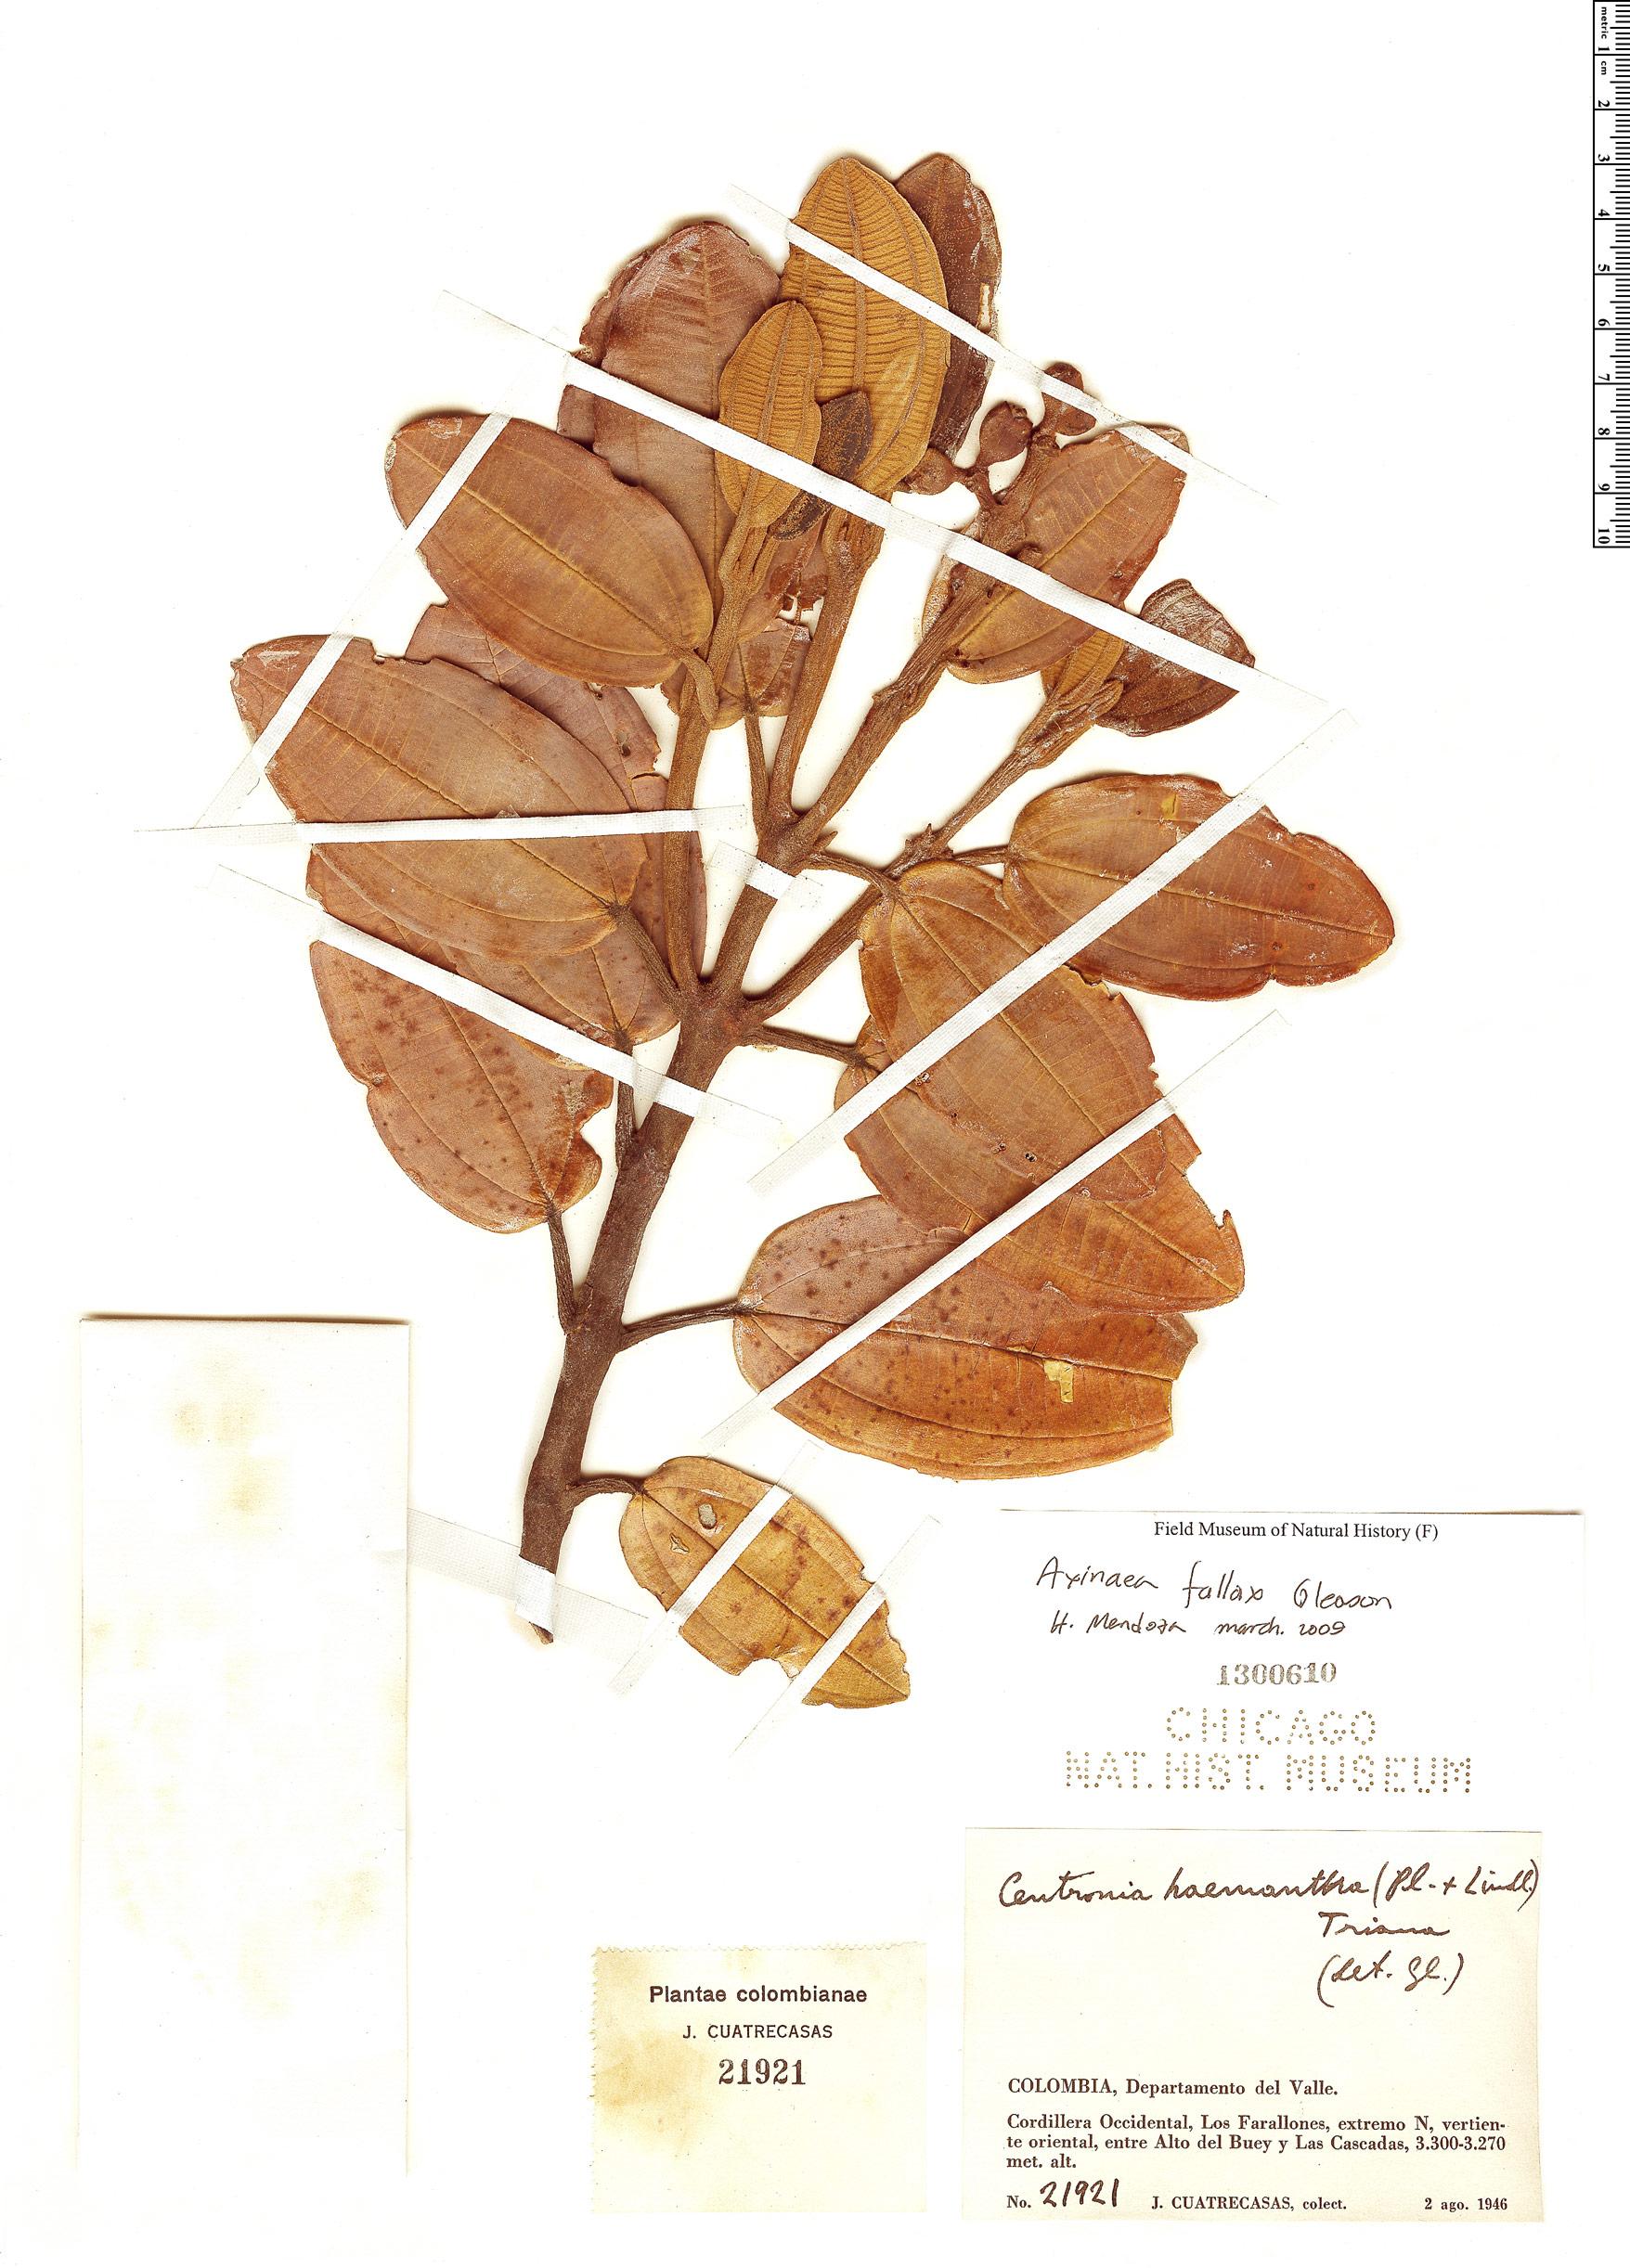 Specimen: Axinaea fallax